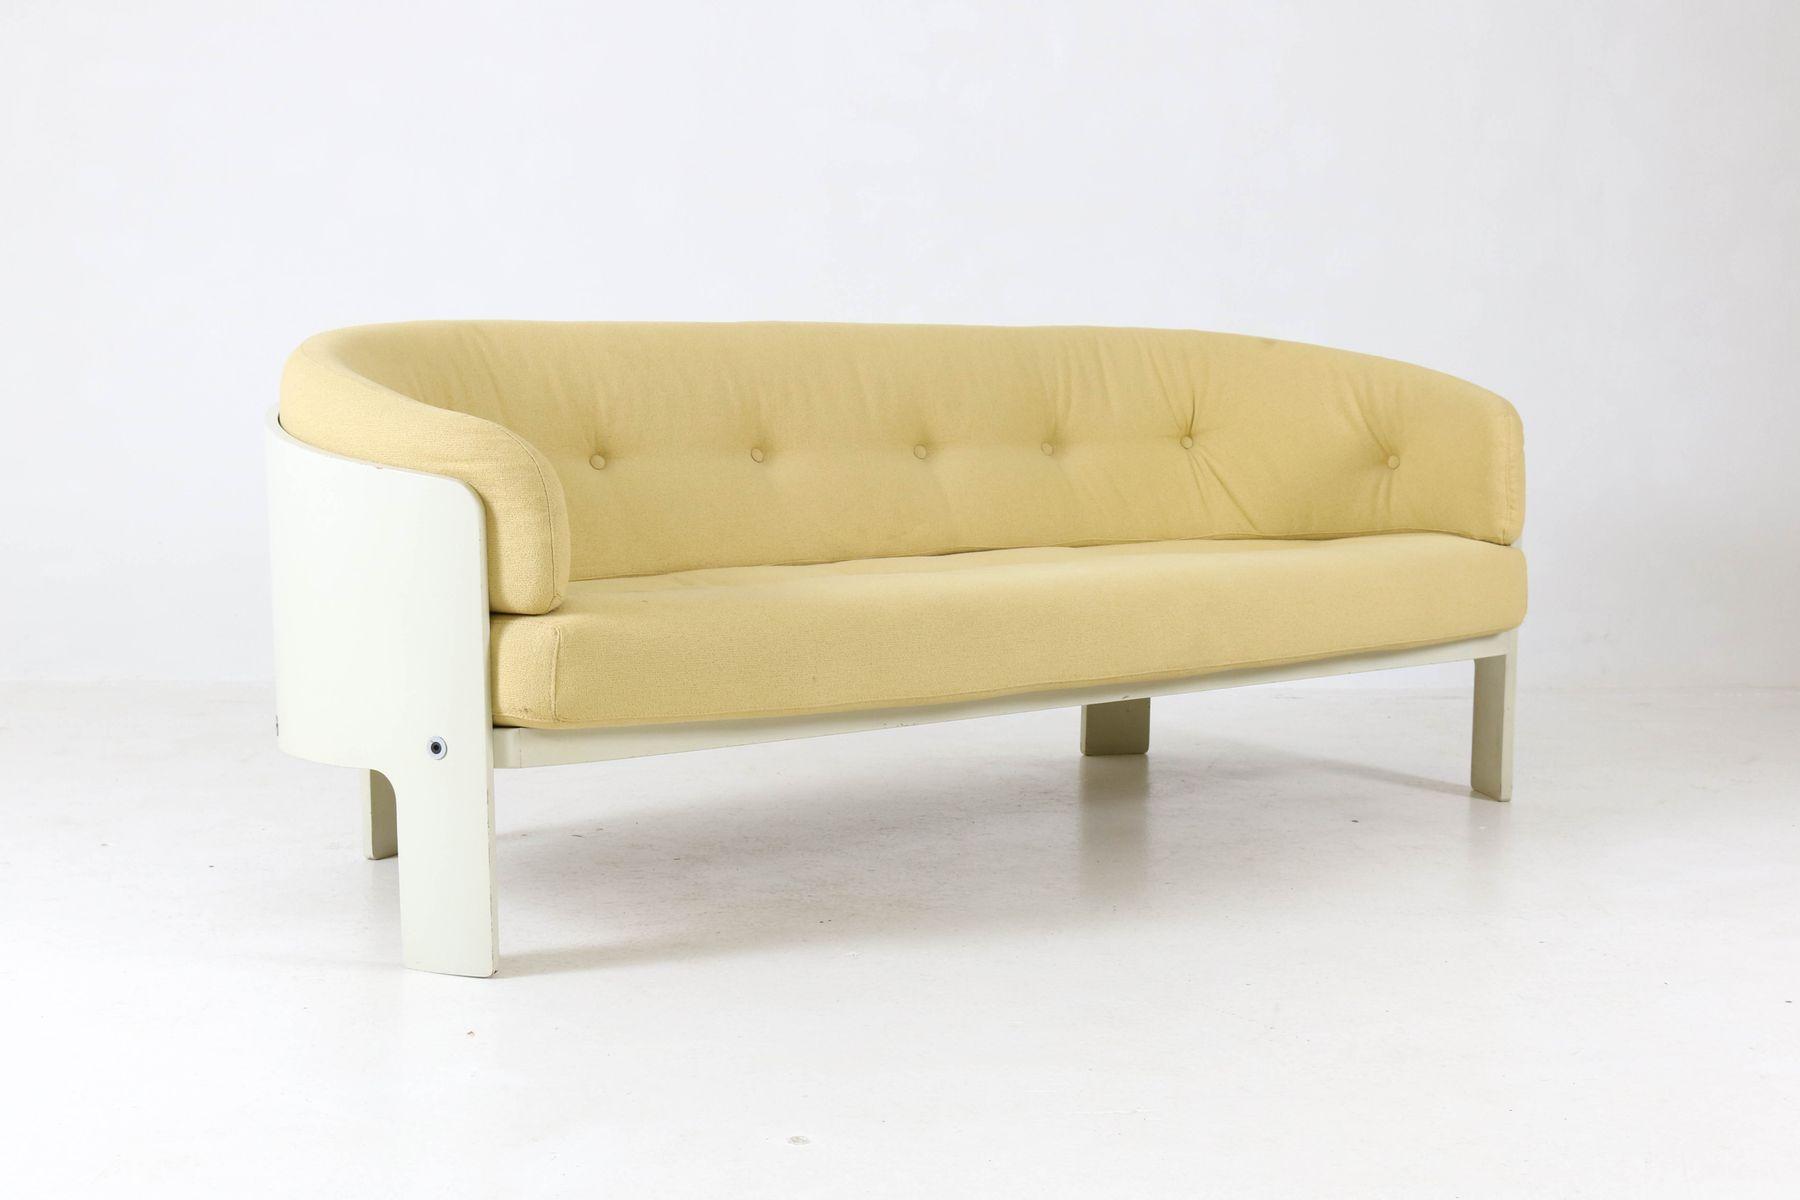 bz49 sofa by hans ell for 39 t spectrum 1970s for sale at pamono. Black Bedroom Furniture Sets. Home Design Ideas